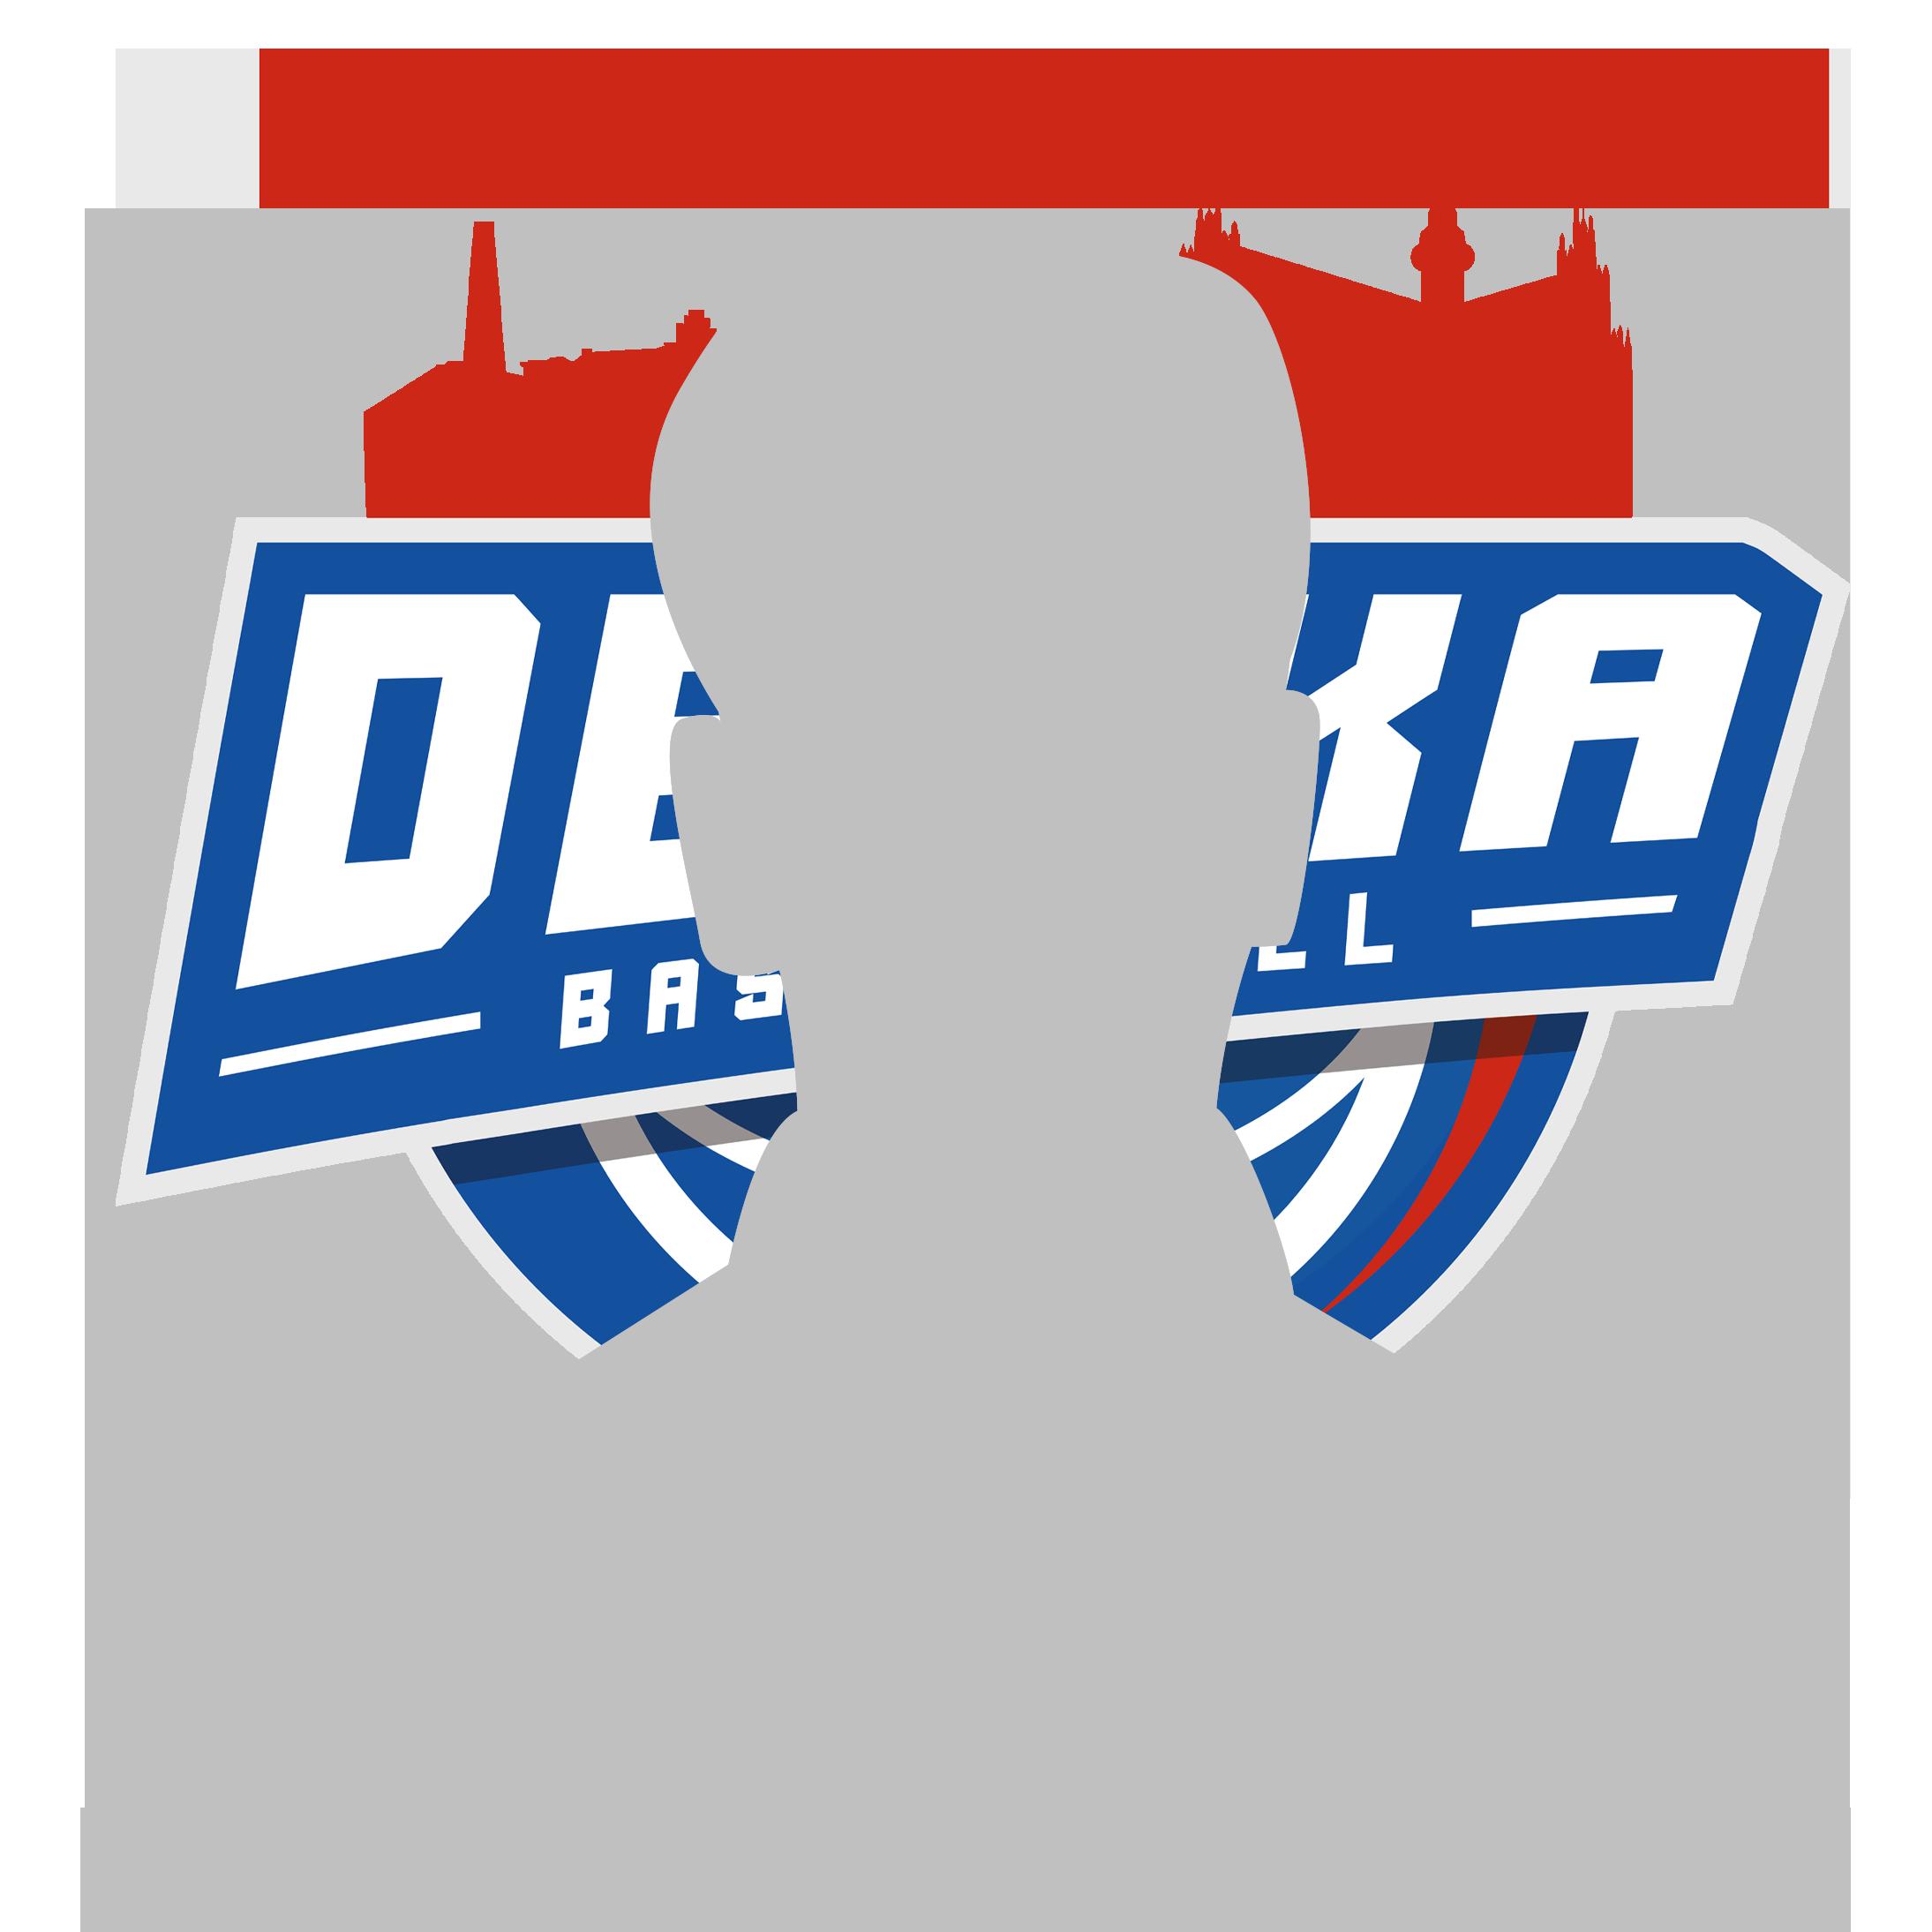 http://deckapelplin.pl/wp-content/uploads/2020/07/anonymous.png